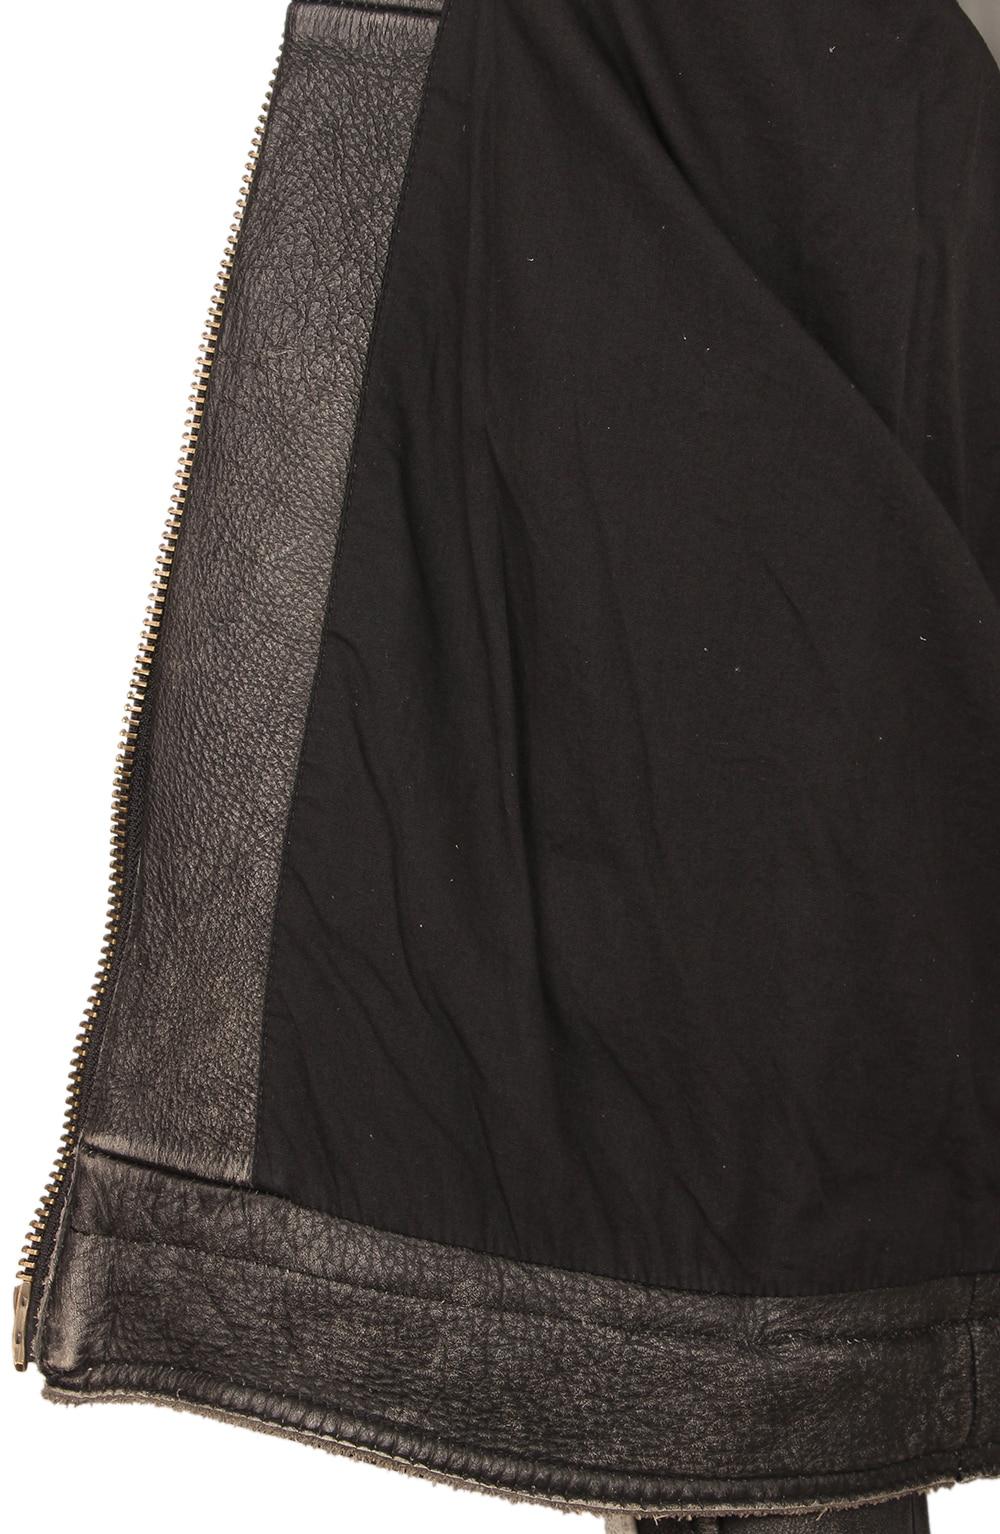 H4d1dcc5999724316b3c75ebb7e5459ebv Vintage Embroidery Skulls Motorcycle Leather Jacket 100% Real Cowhide Moto Jacket Biker Leather Coat Winter Motor Clothing M220